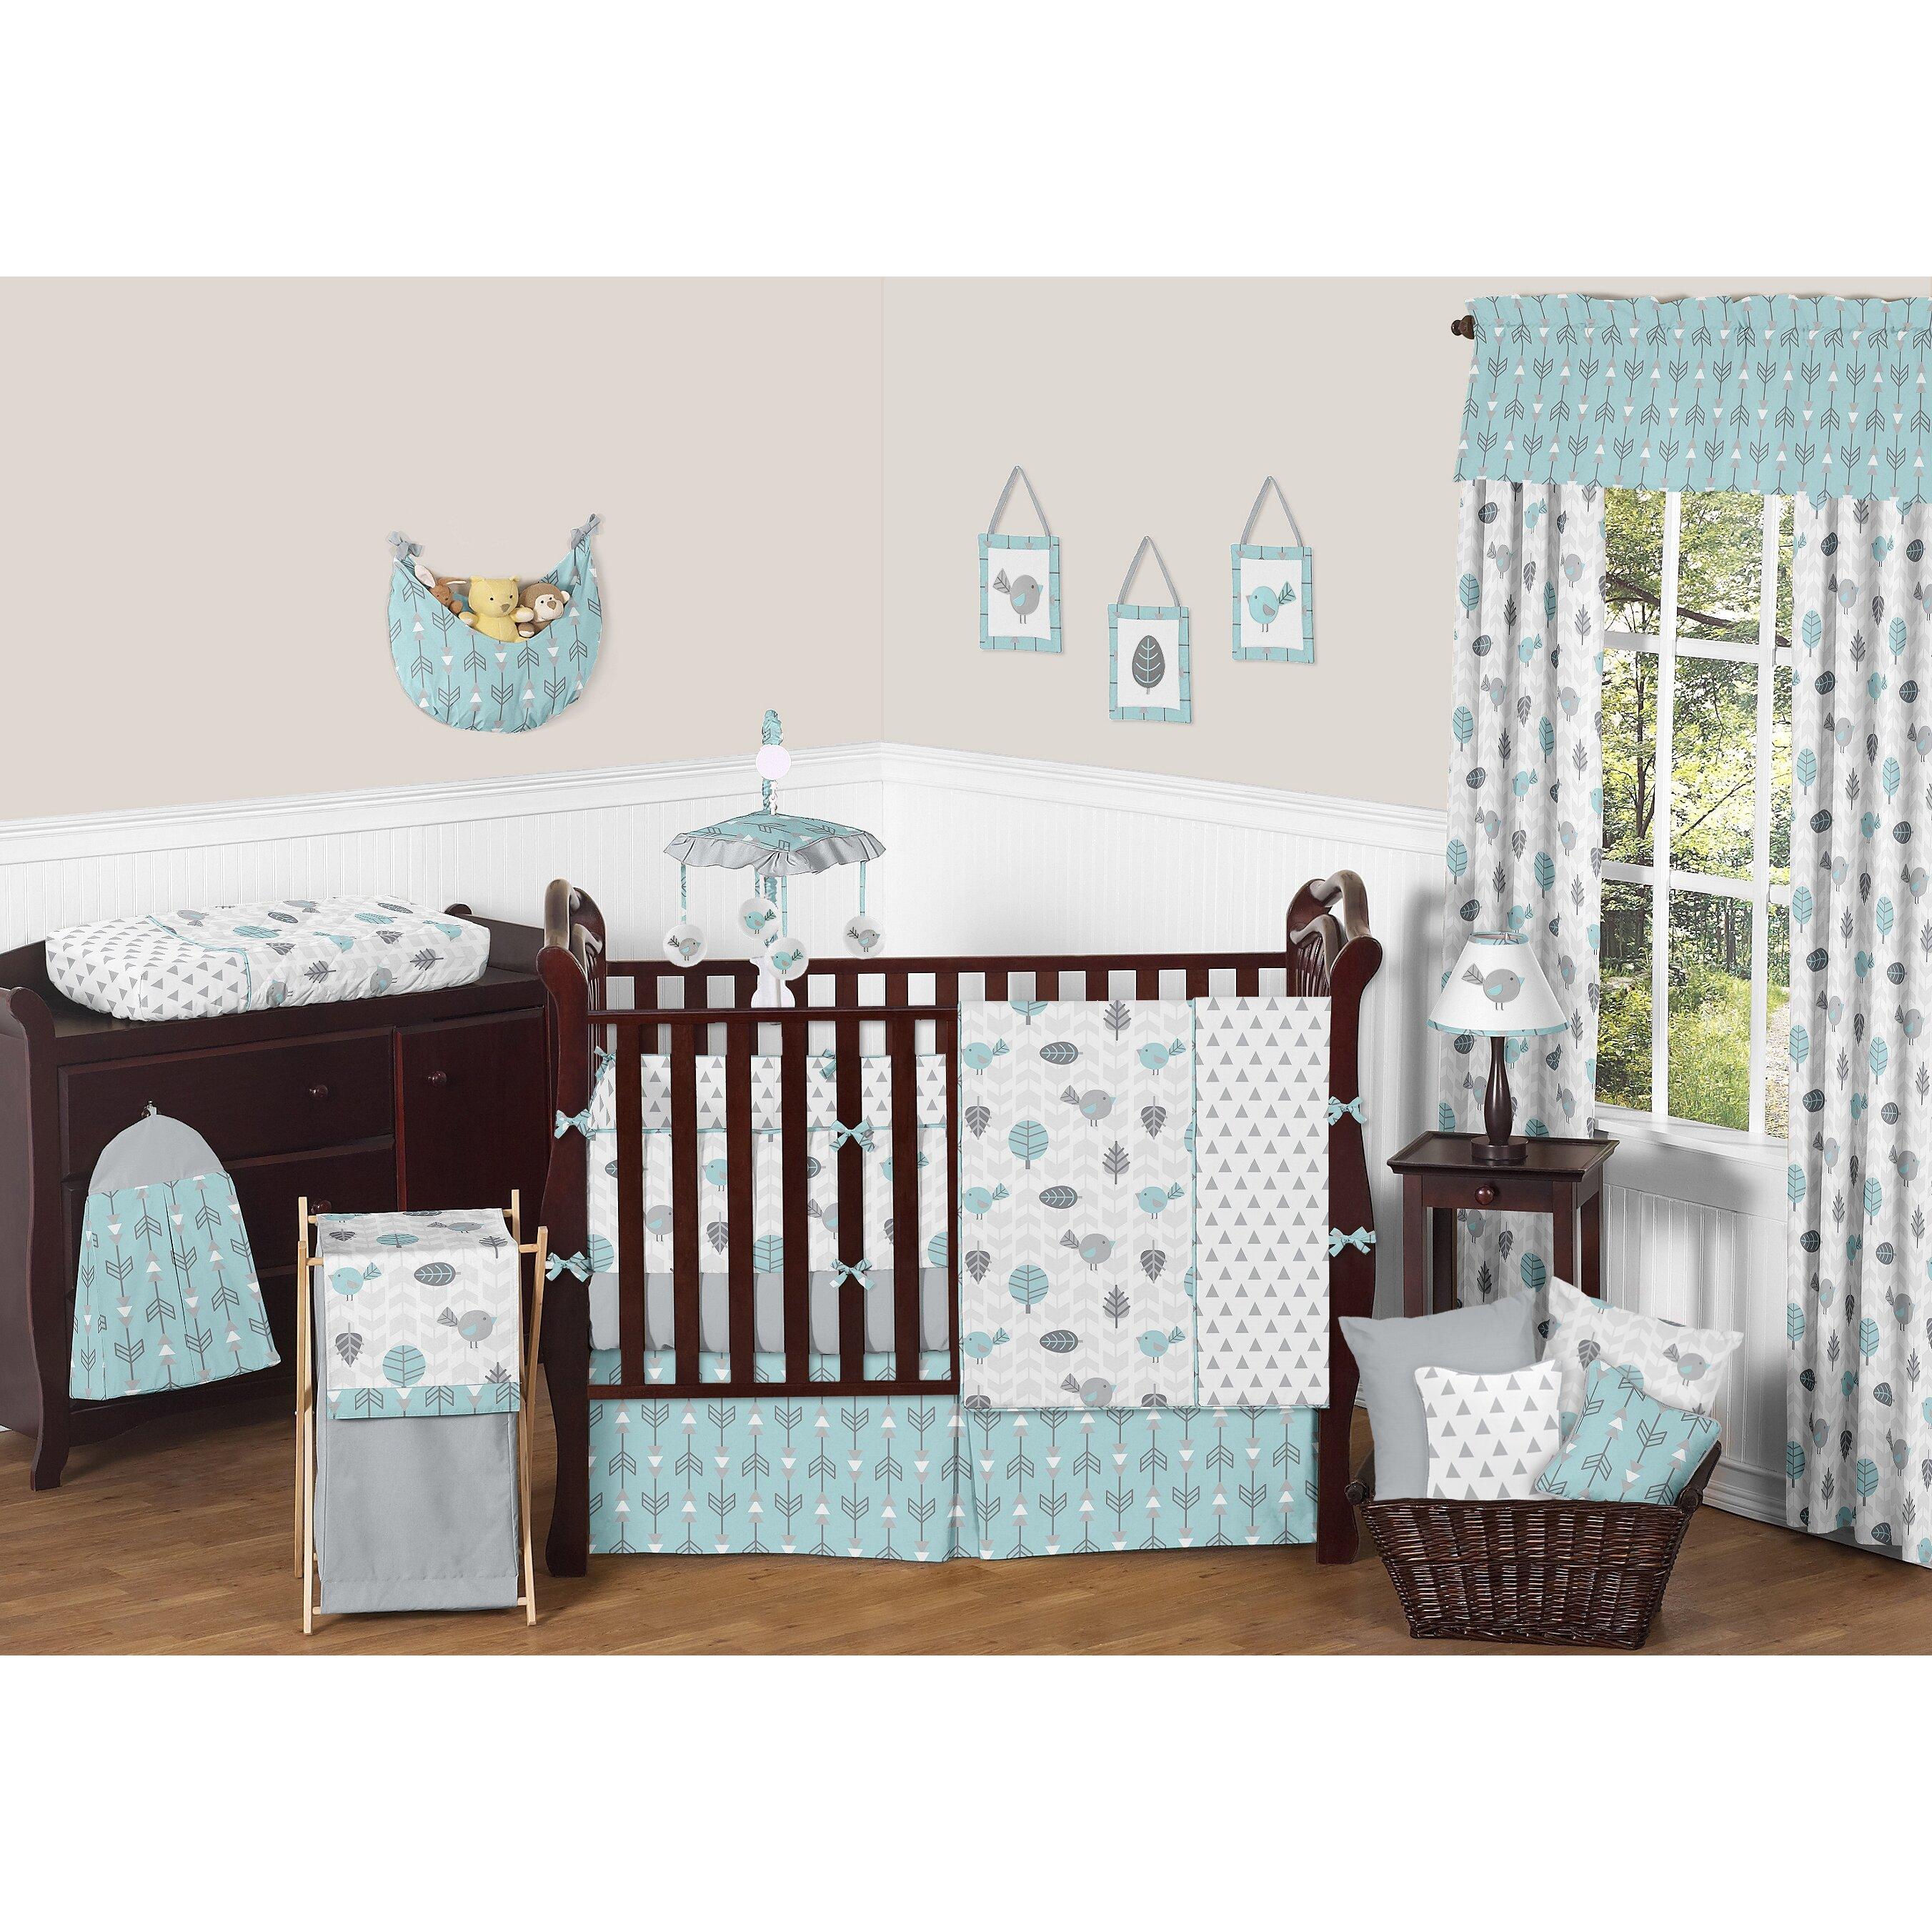 Crib for sale gatineau - Sweet Jojo Designs Earth And Sky 9 Piece Crib Bedding Set